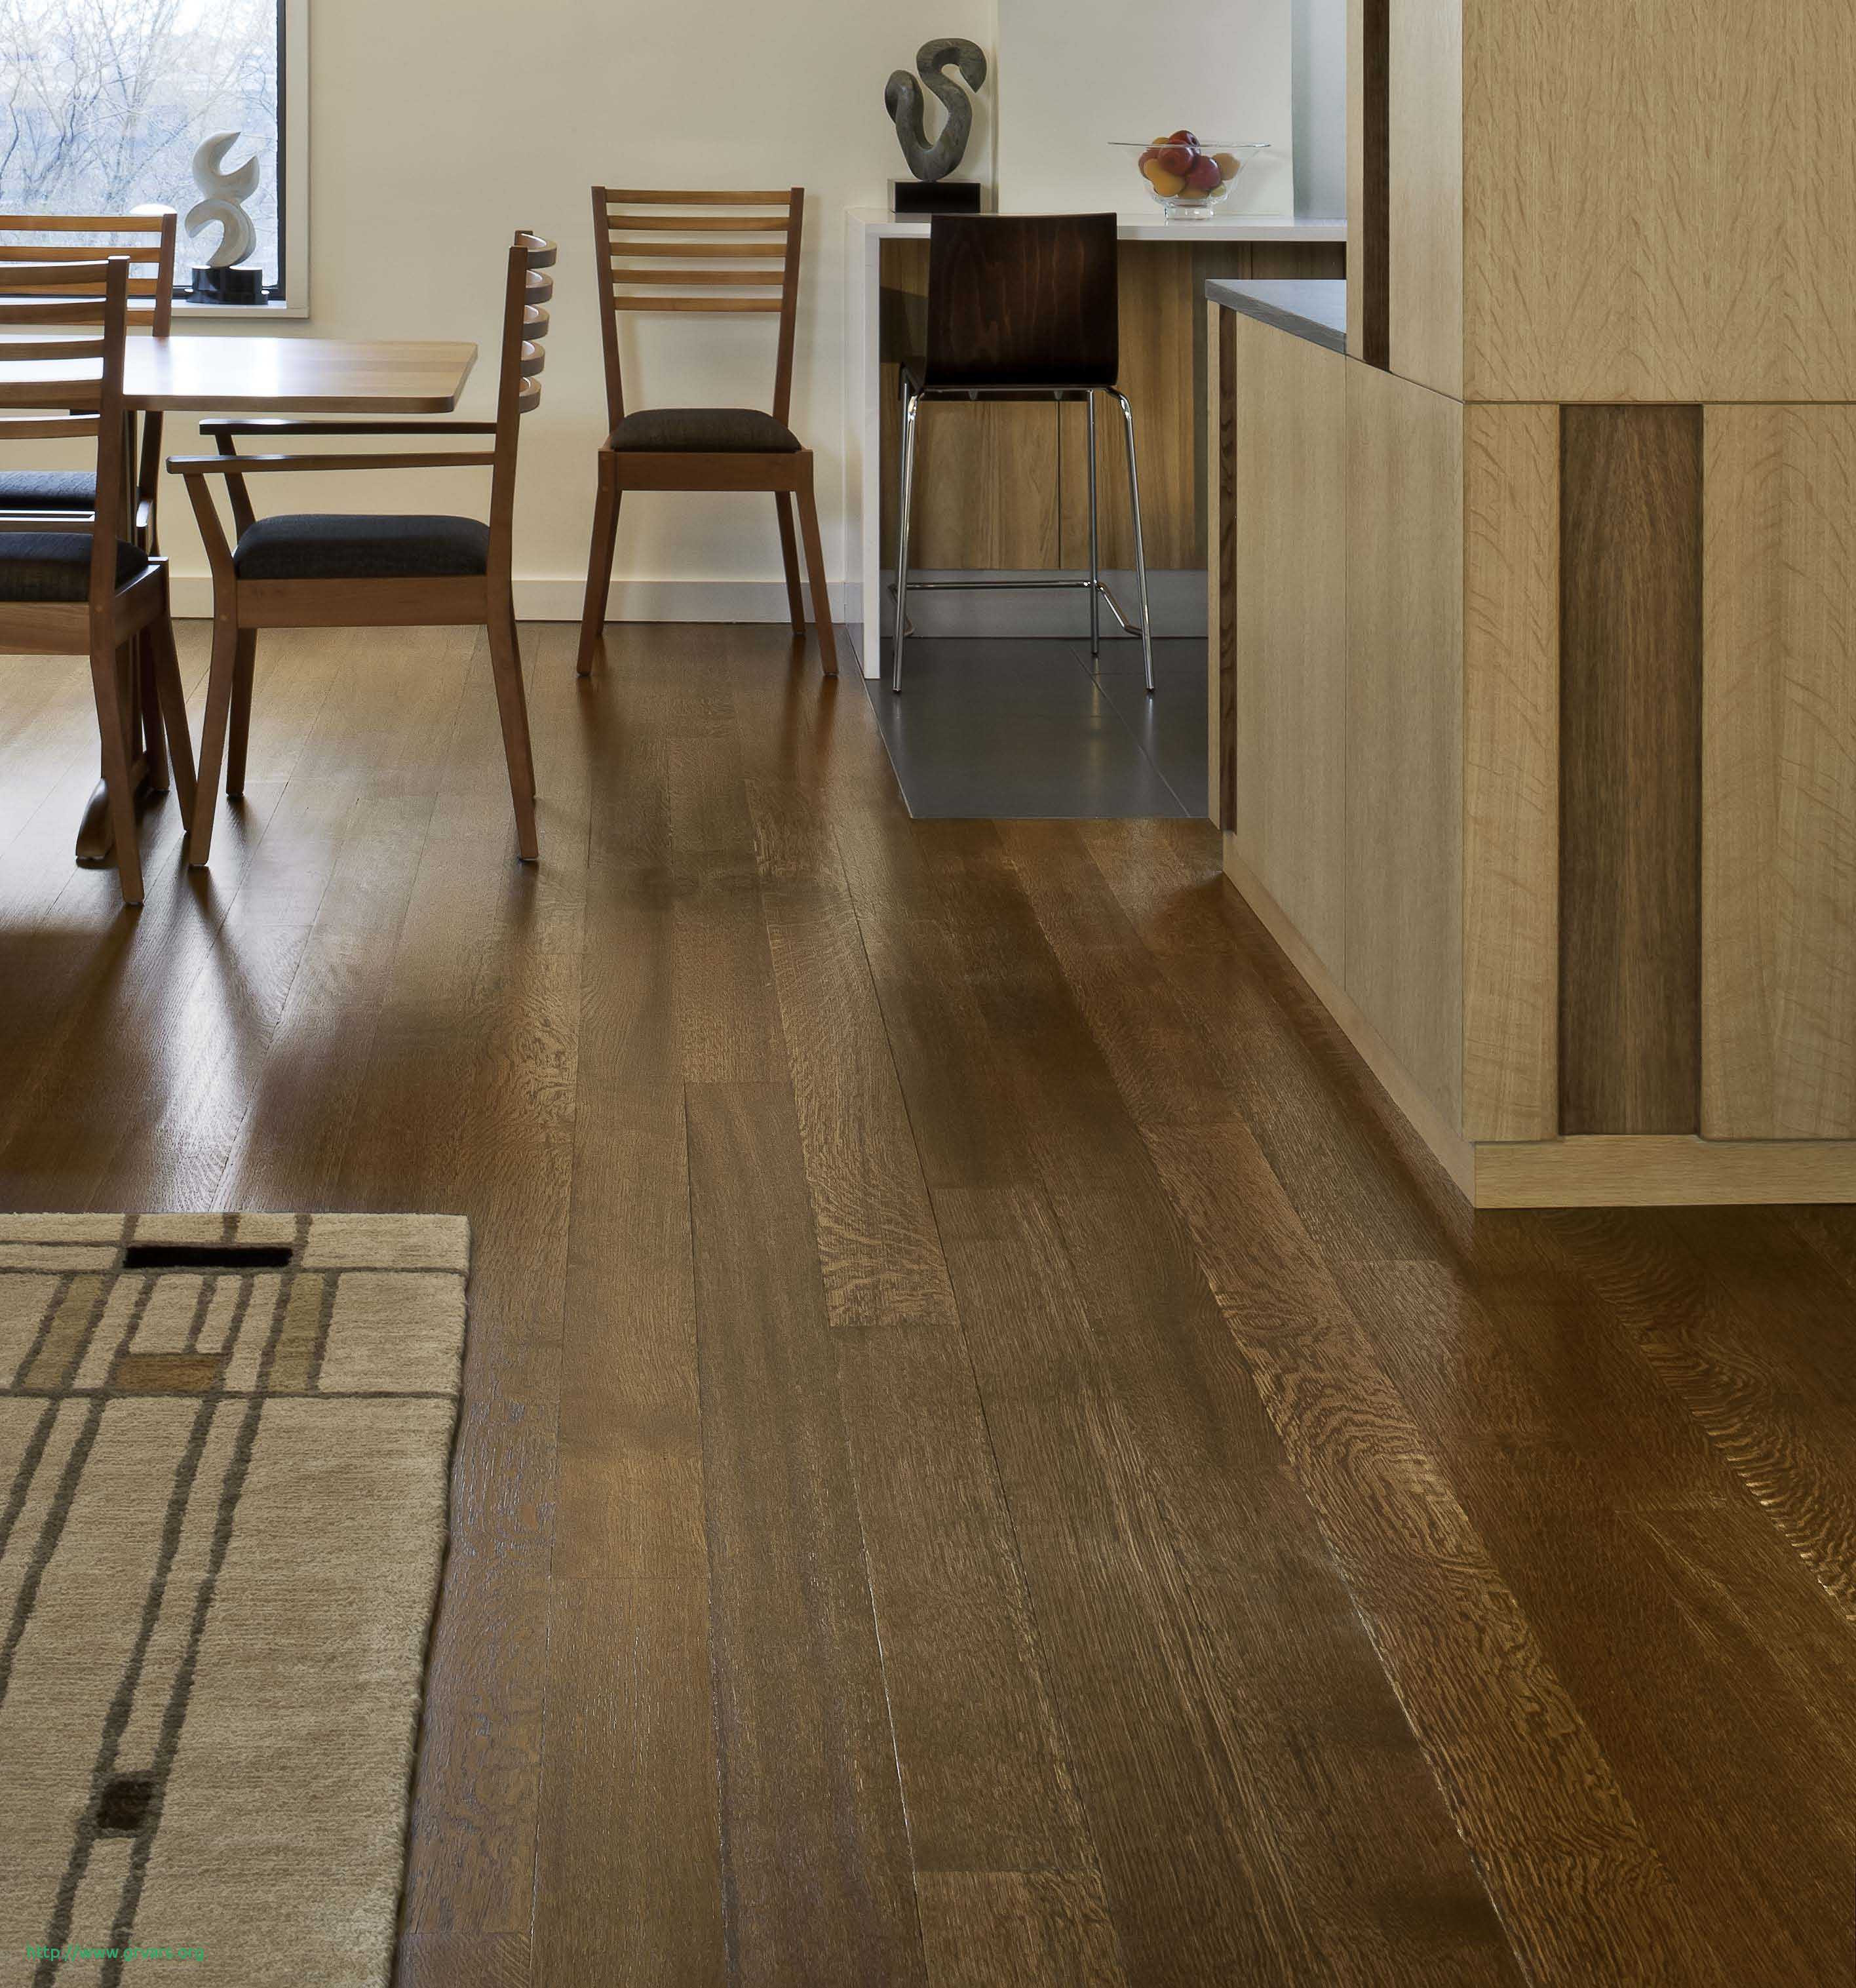 walnut hardwood flooring ottawa of 21 beau cheapest hardwood flooring in toronto ideas blog throughout cheapest hardwood flooring in toronto impressionnant fabulous discount hardwood flooring 0 floor brampton 25 toronto